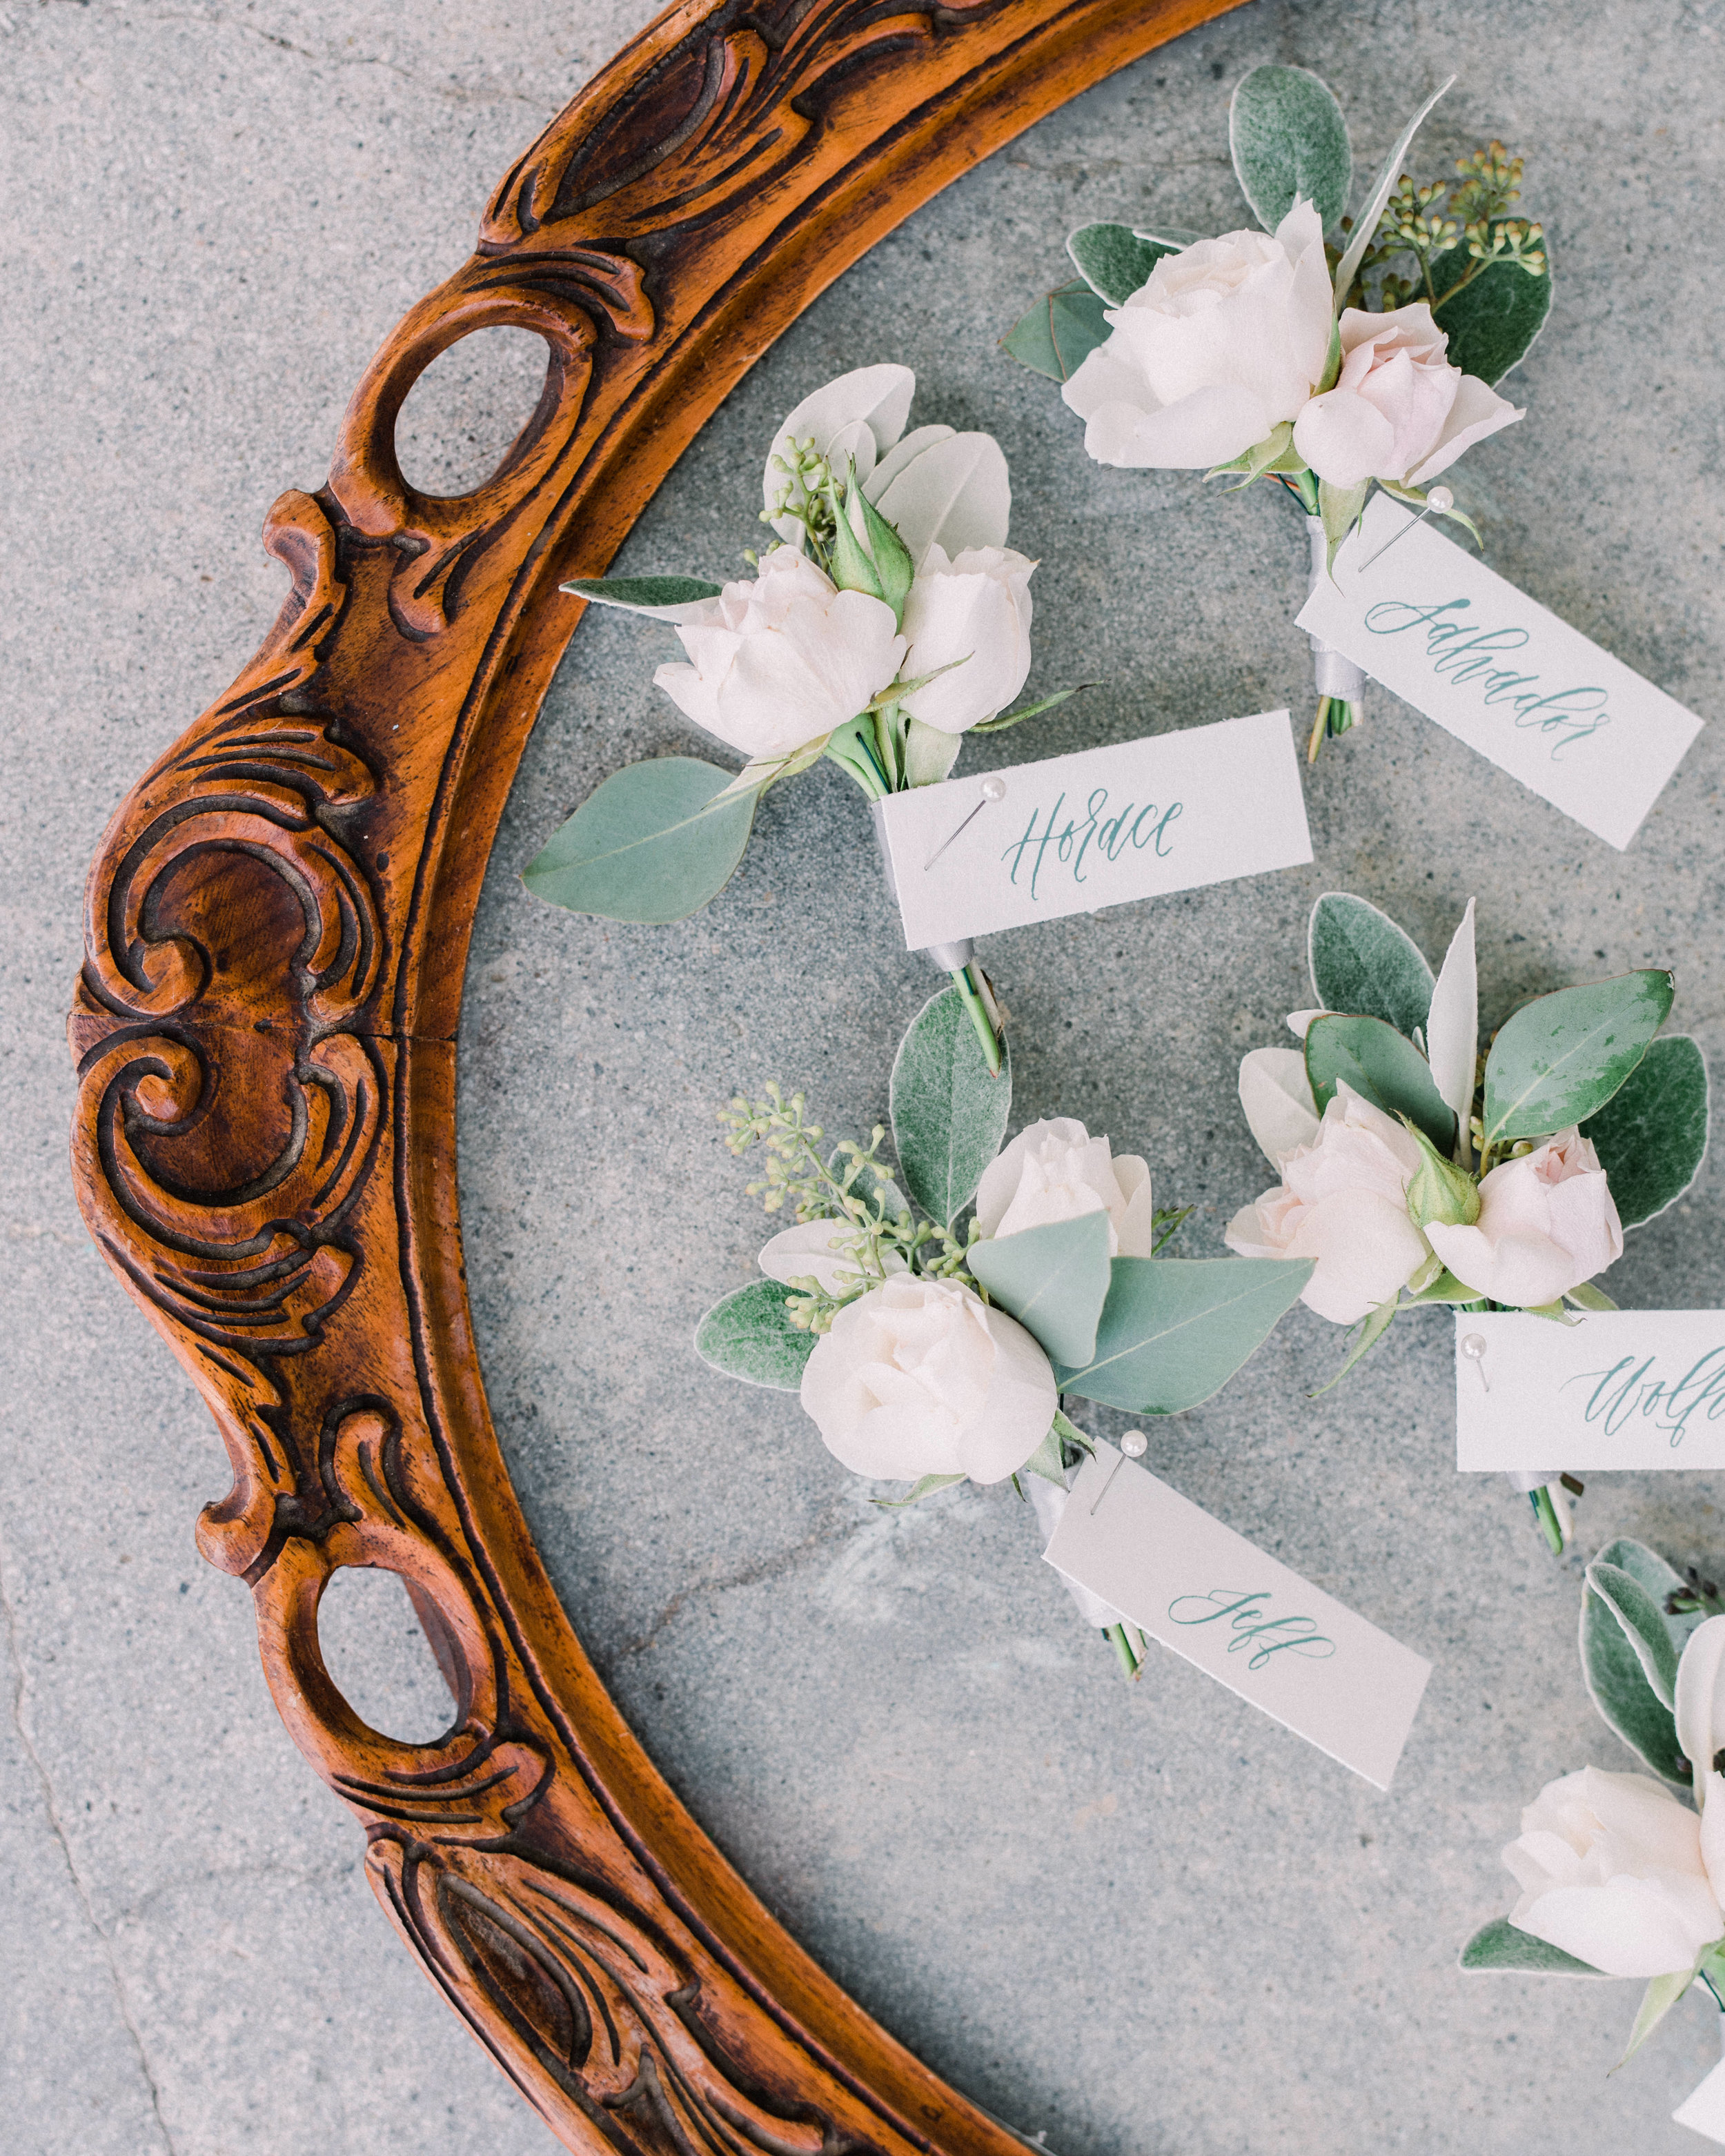 rosario-resort-orcas-island-wedding-ryan-flynn-photography-md-details-0019.JPG